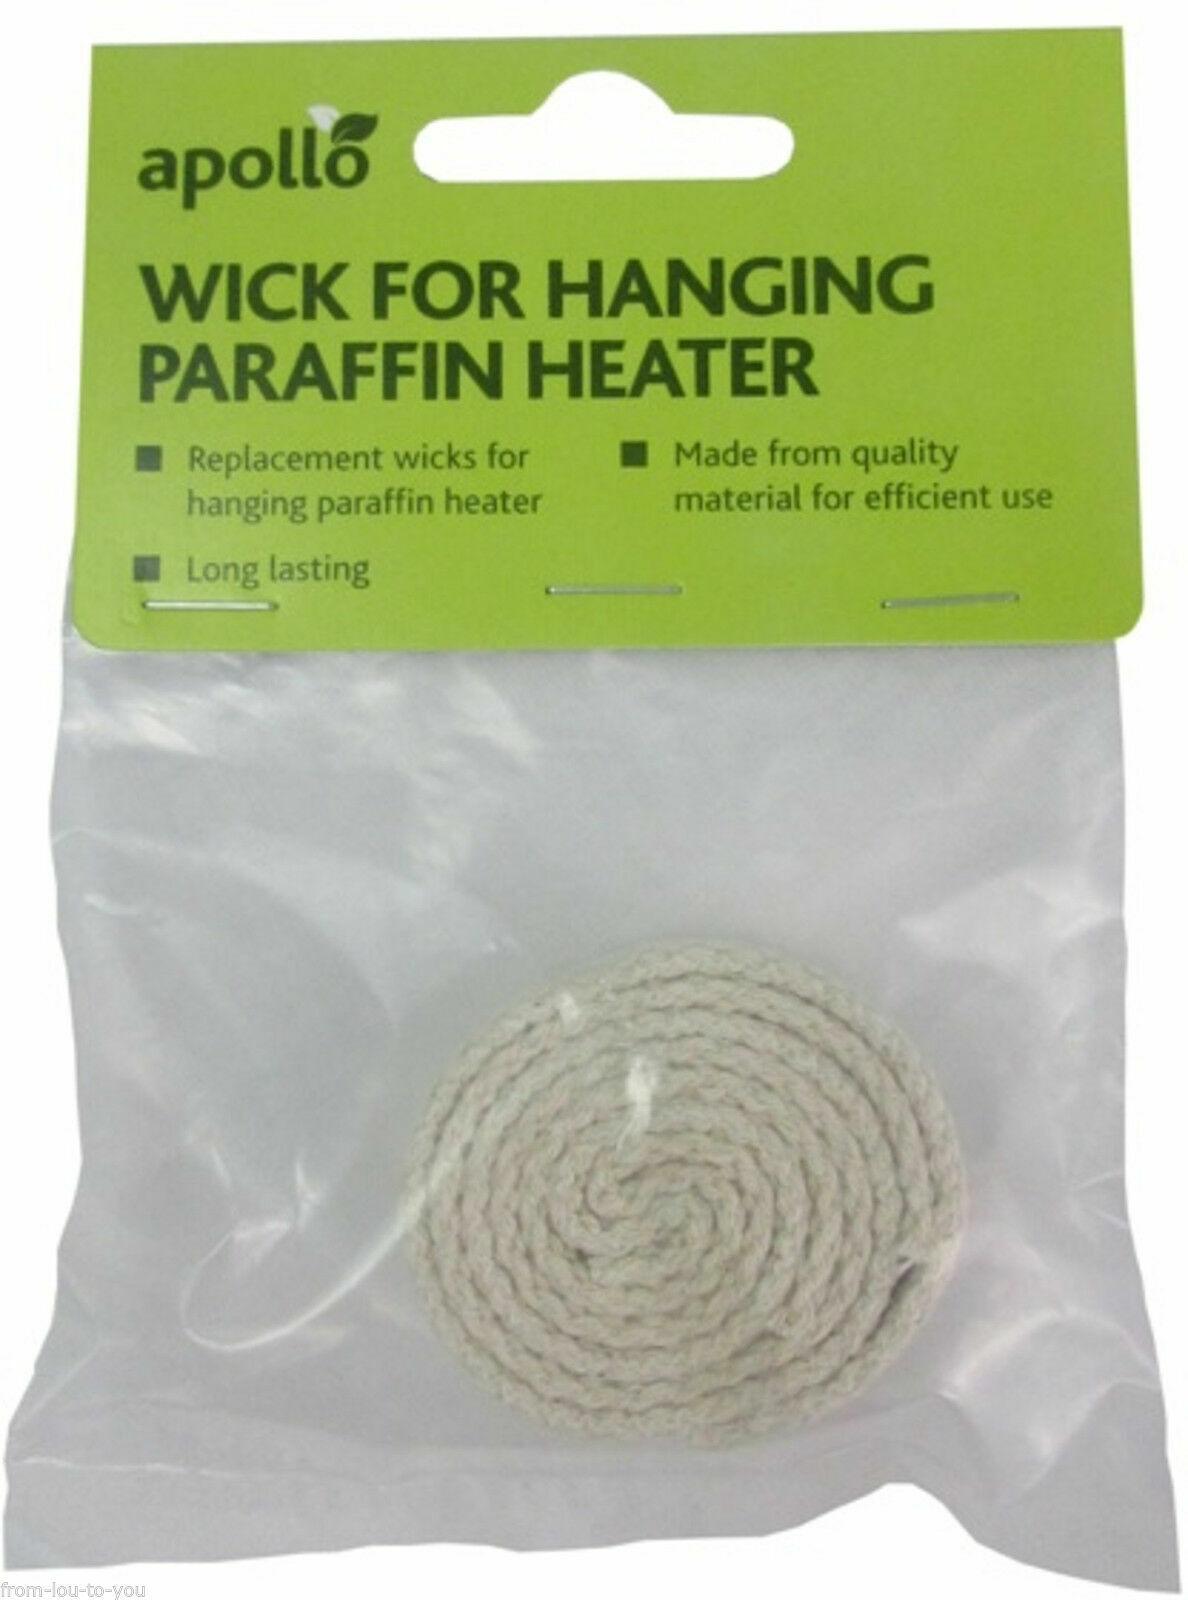 2 x Parasene Hanging Paraffin Heater